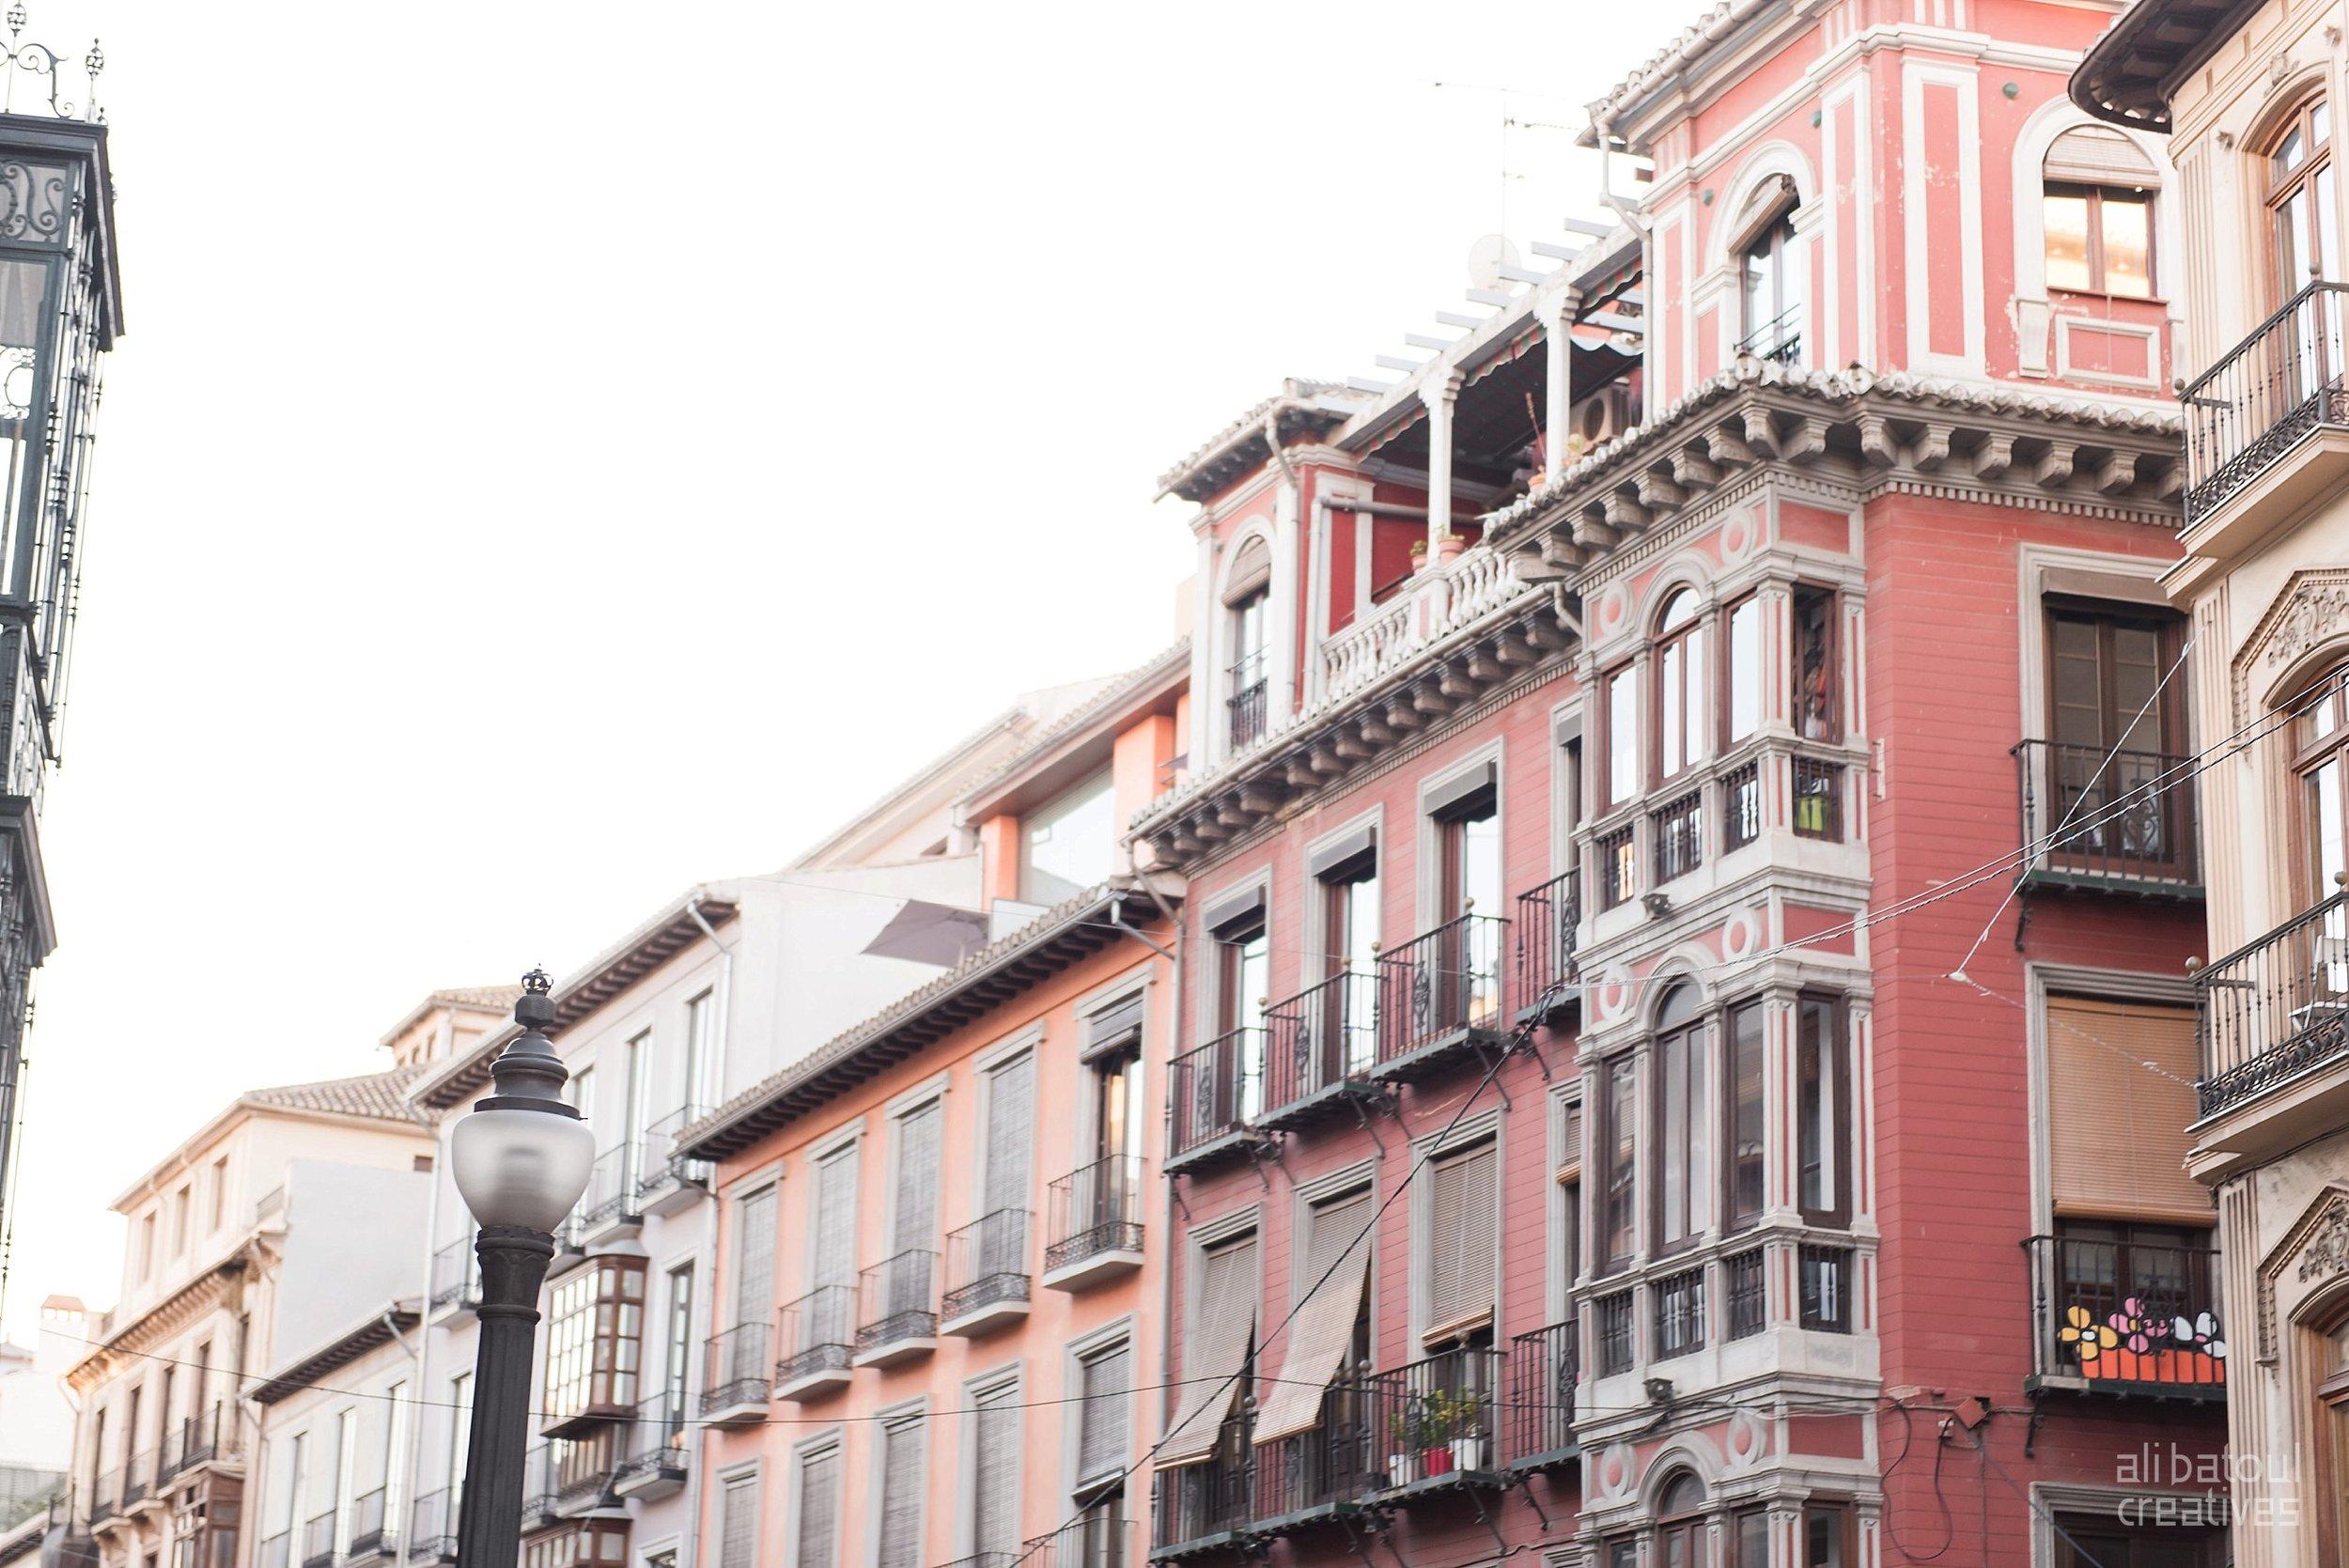 Granada (Part II) - Ali Batoul Creatives-16_Stomped.jpg